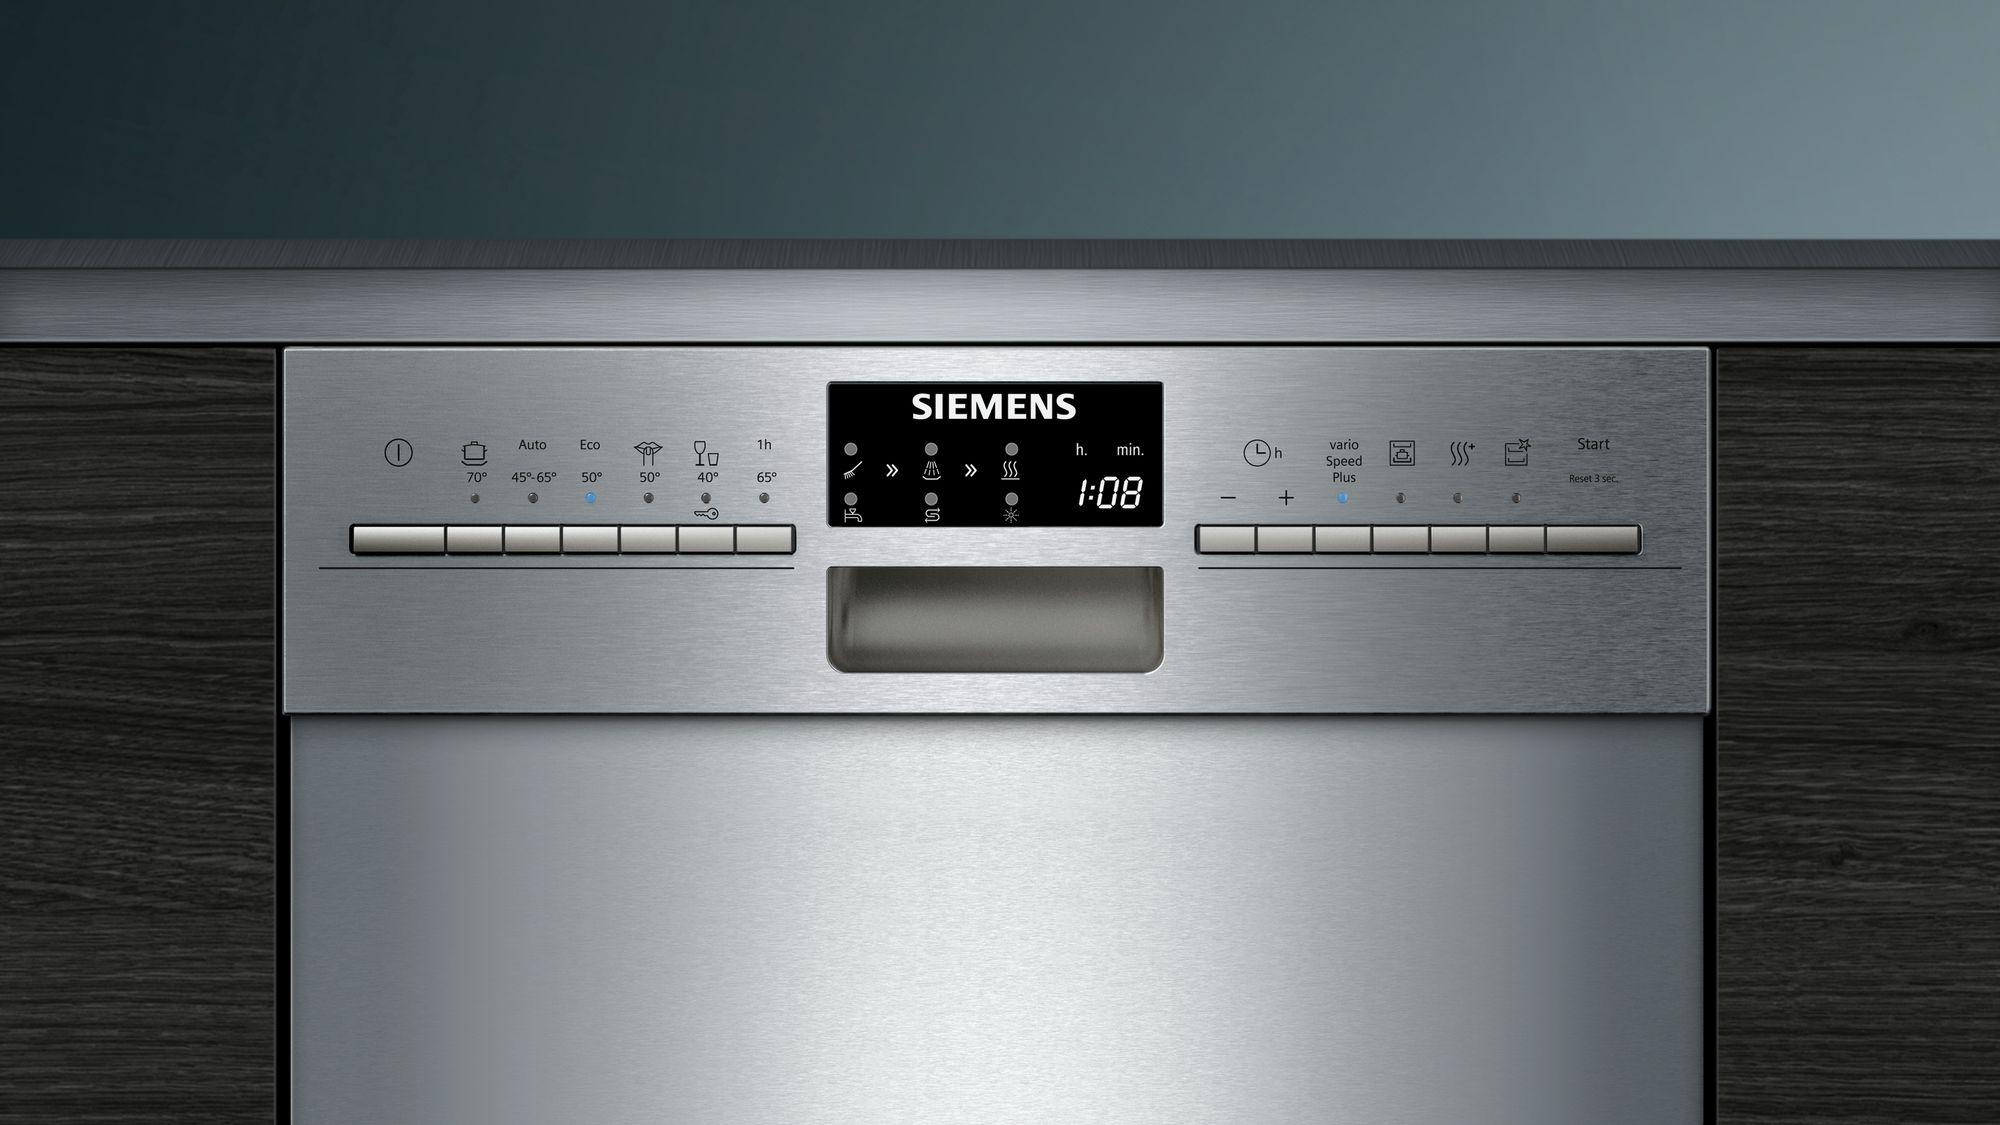 Siemens geschirrspüler speedmatic45 unterbau edelstahl 45 cm